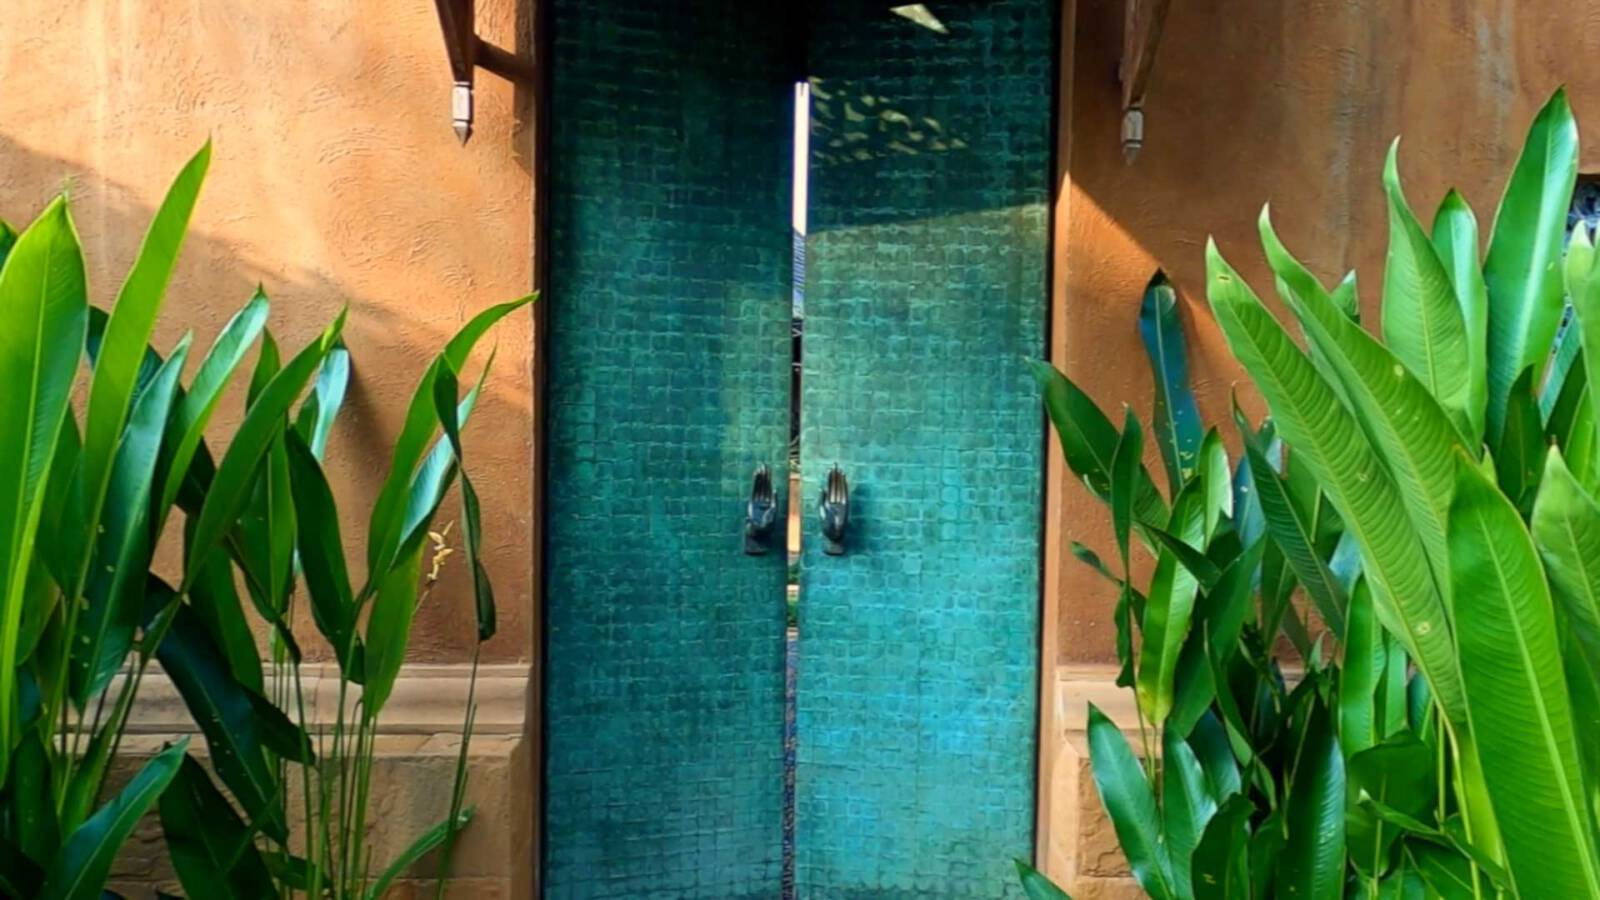 Howie's HomeStay luxury hotel Chiang Mai